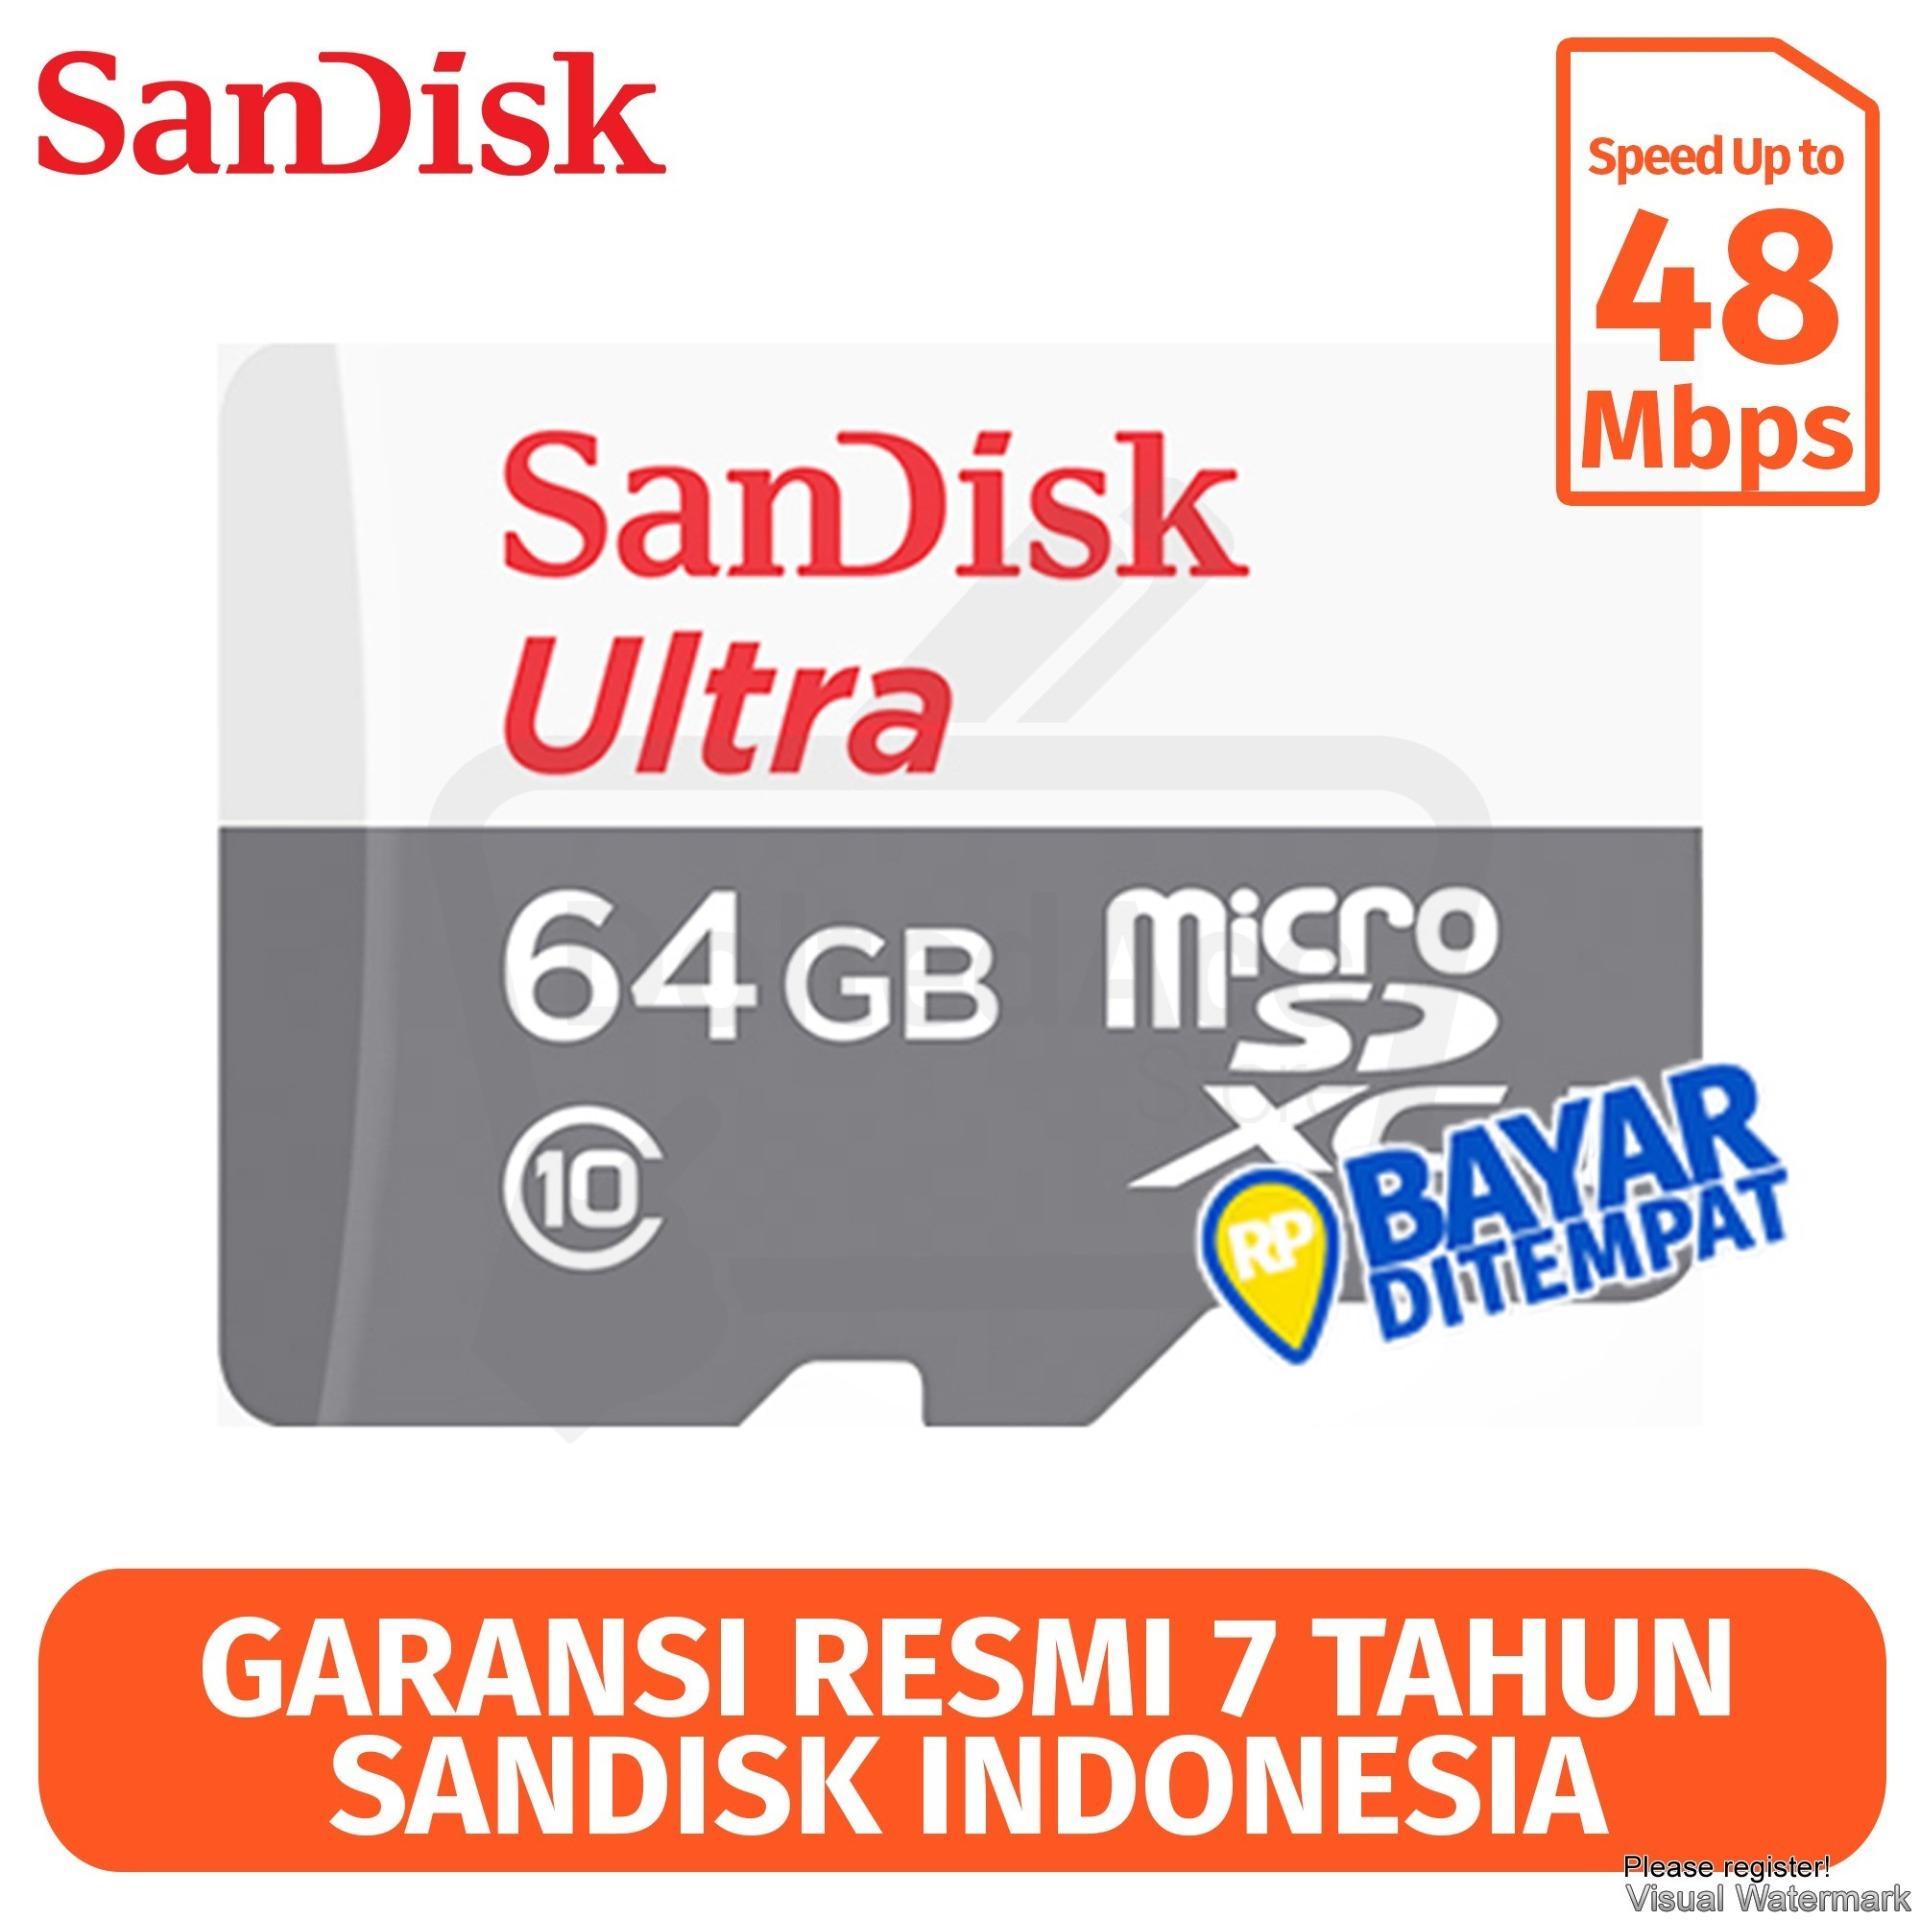 Sandisk Ultra MicroSD Memory Card [16GB/ 80Mbps/ No Adapter] *NEW Original